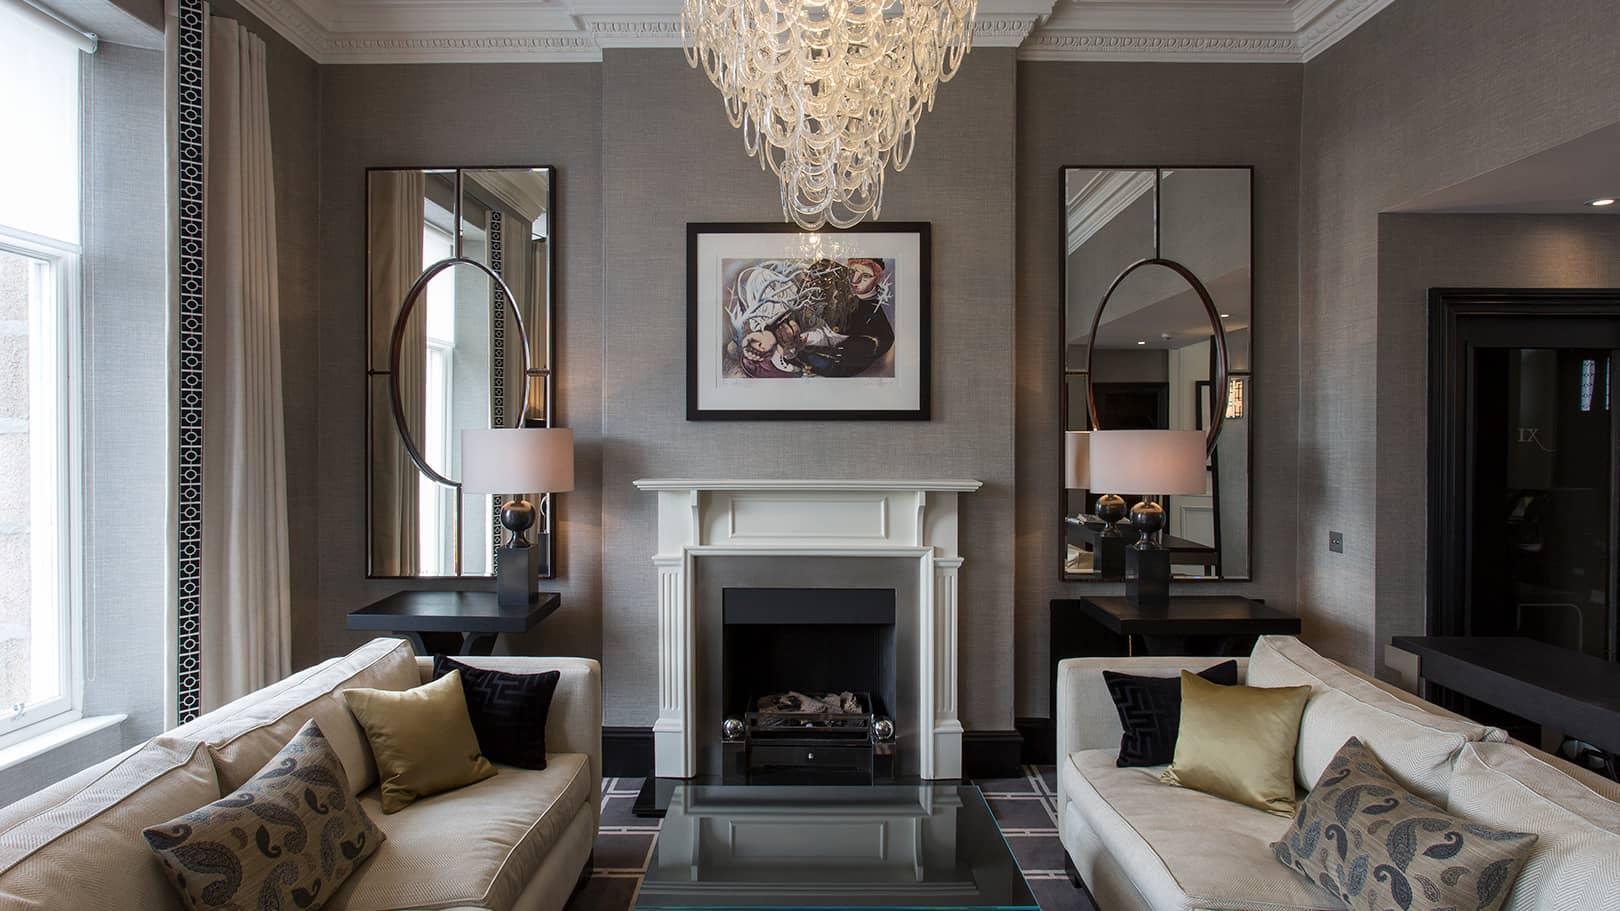 The Best Interior Design in the UK  The List - House & Garden